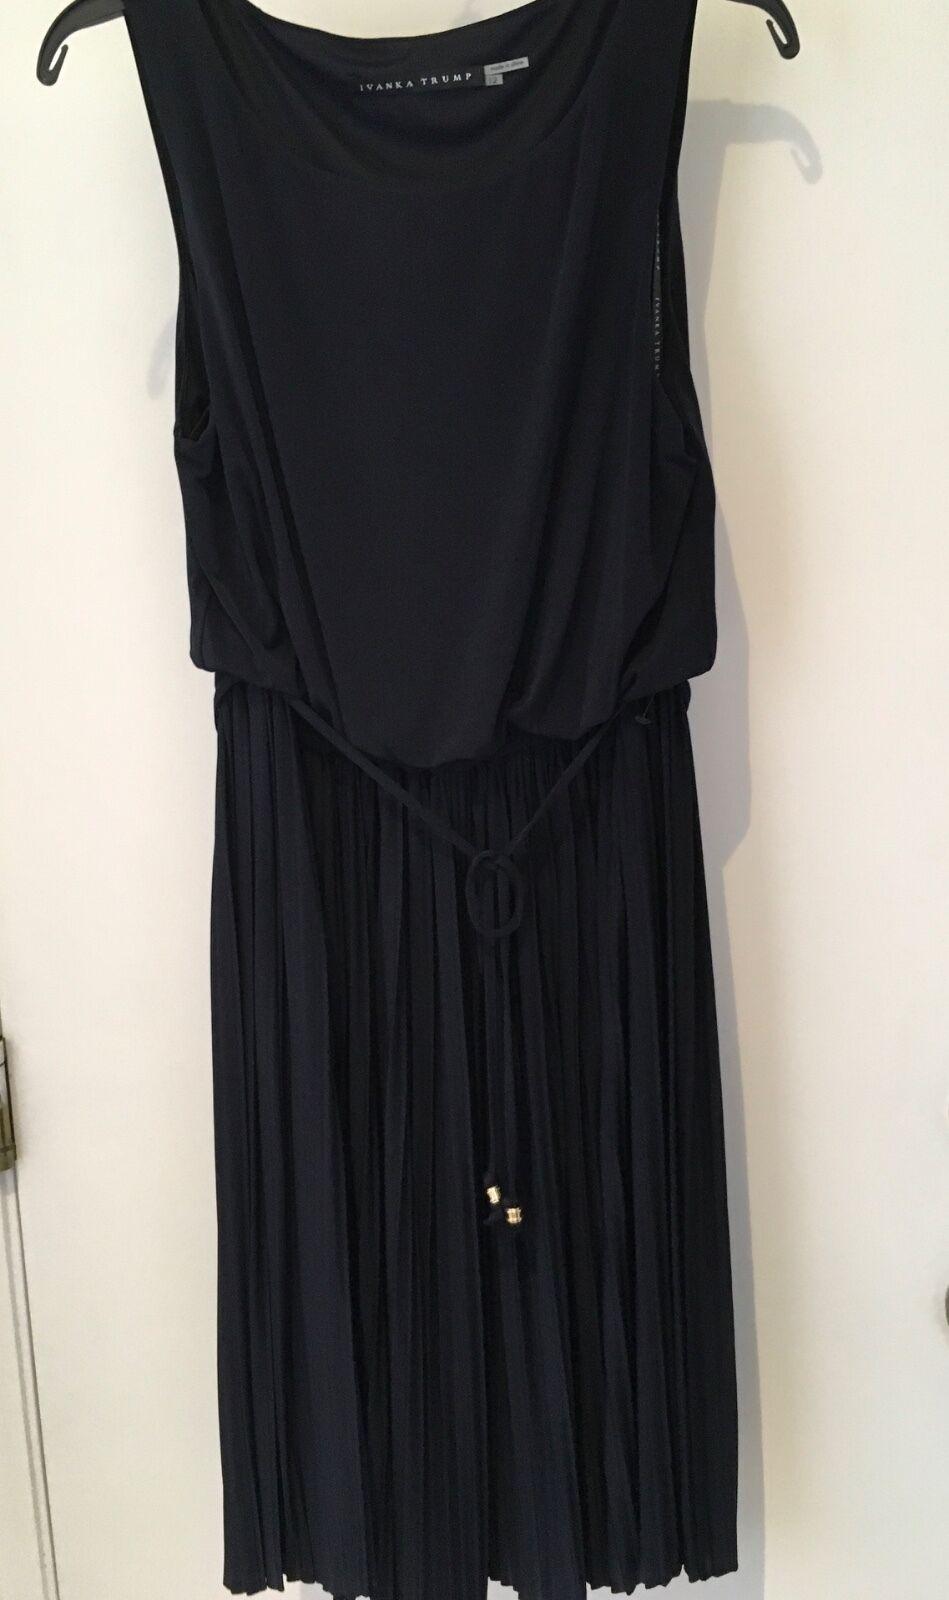 Ivanka Trump Matte Jersey Navy blueE size 10 Sleeveless Tea Dress NWT